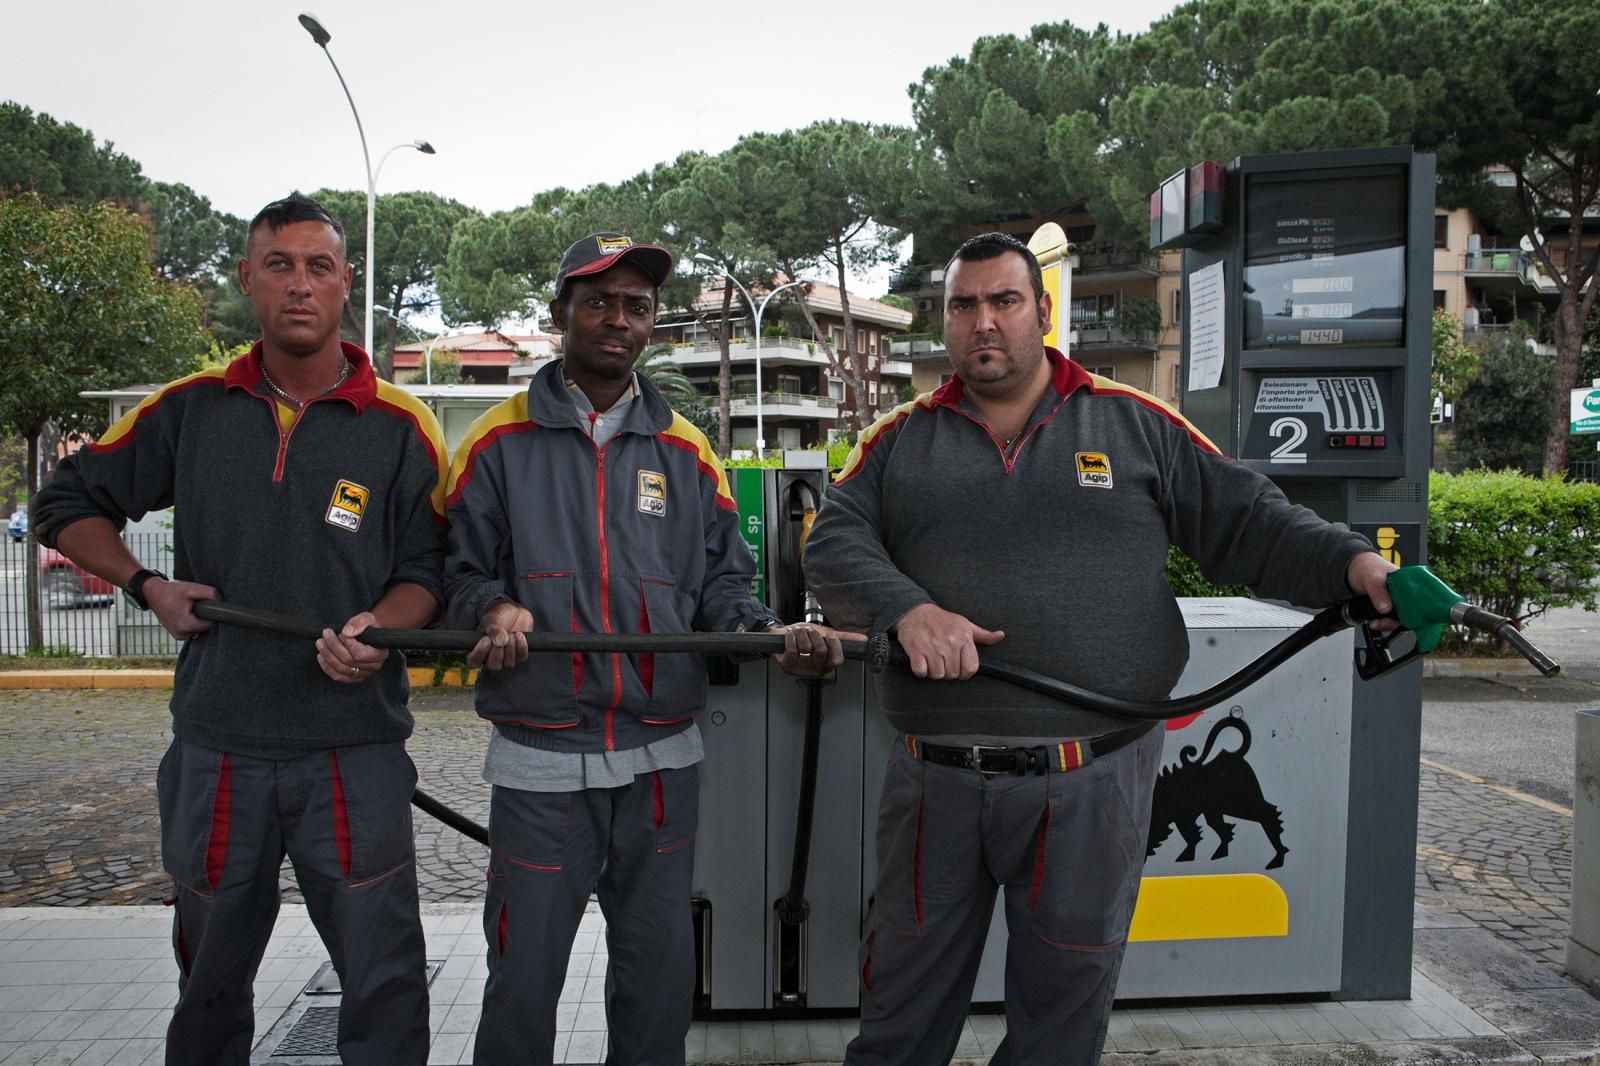 Fulvio, Giacinto e Marco GAS STATION ATTENDANTS